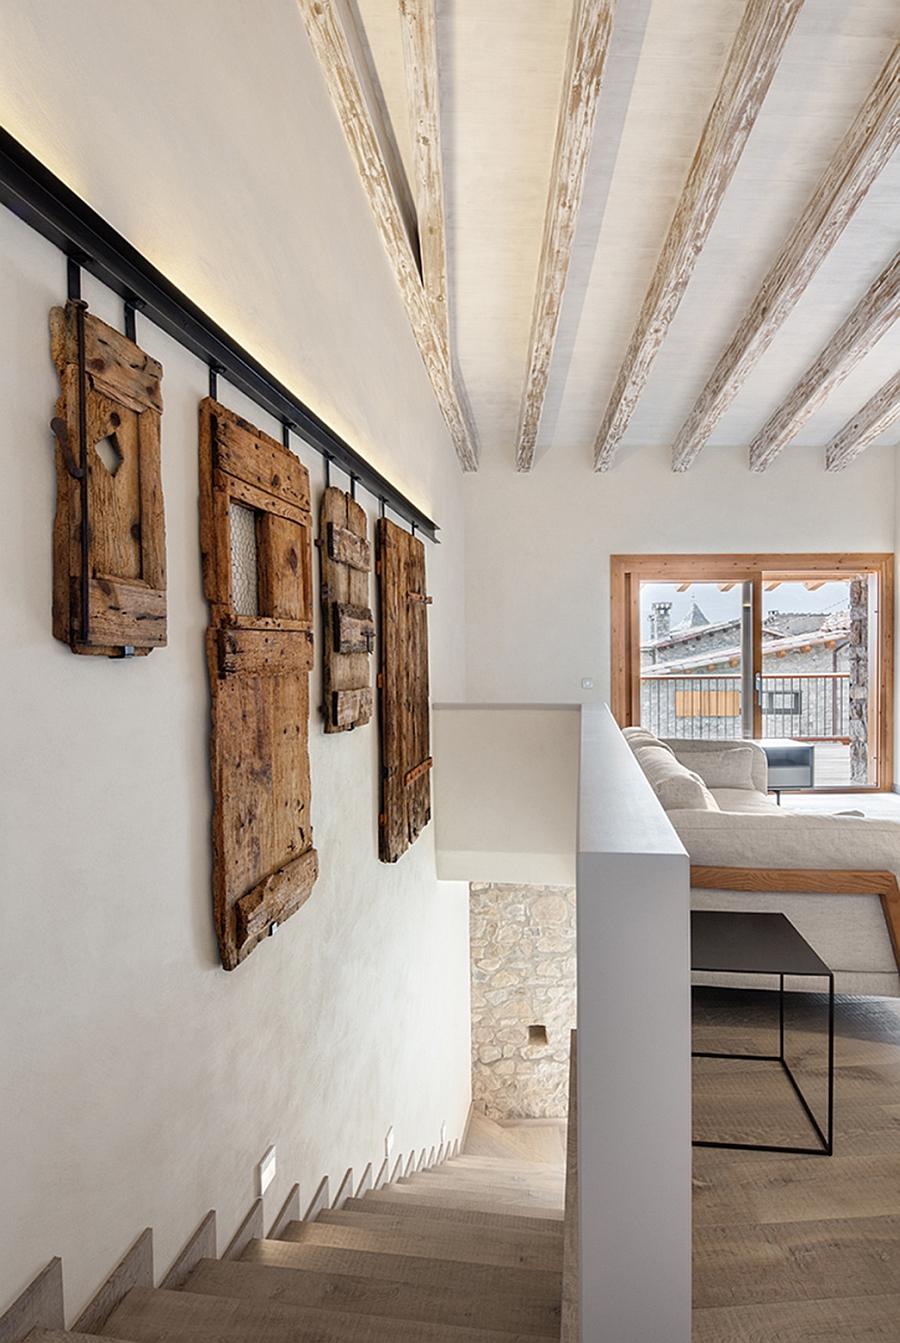 Masia espanola convertida en una casa moderna 10